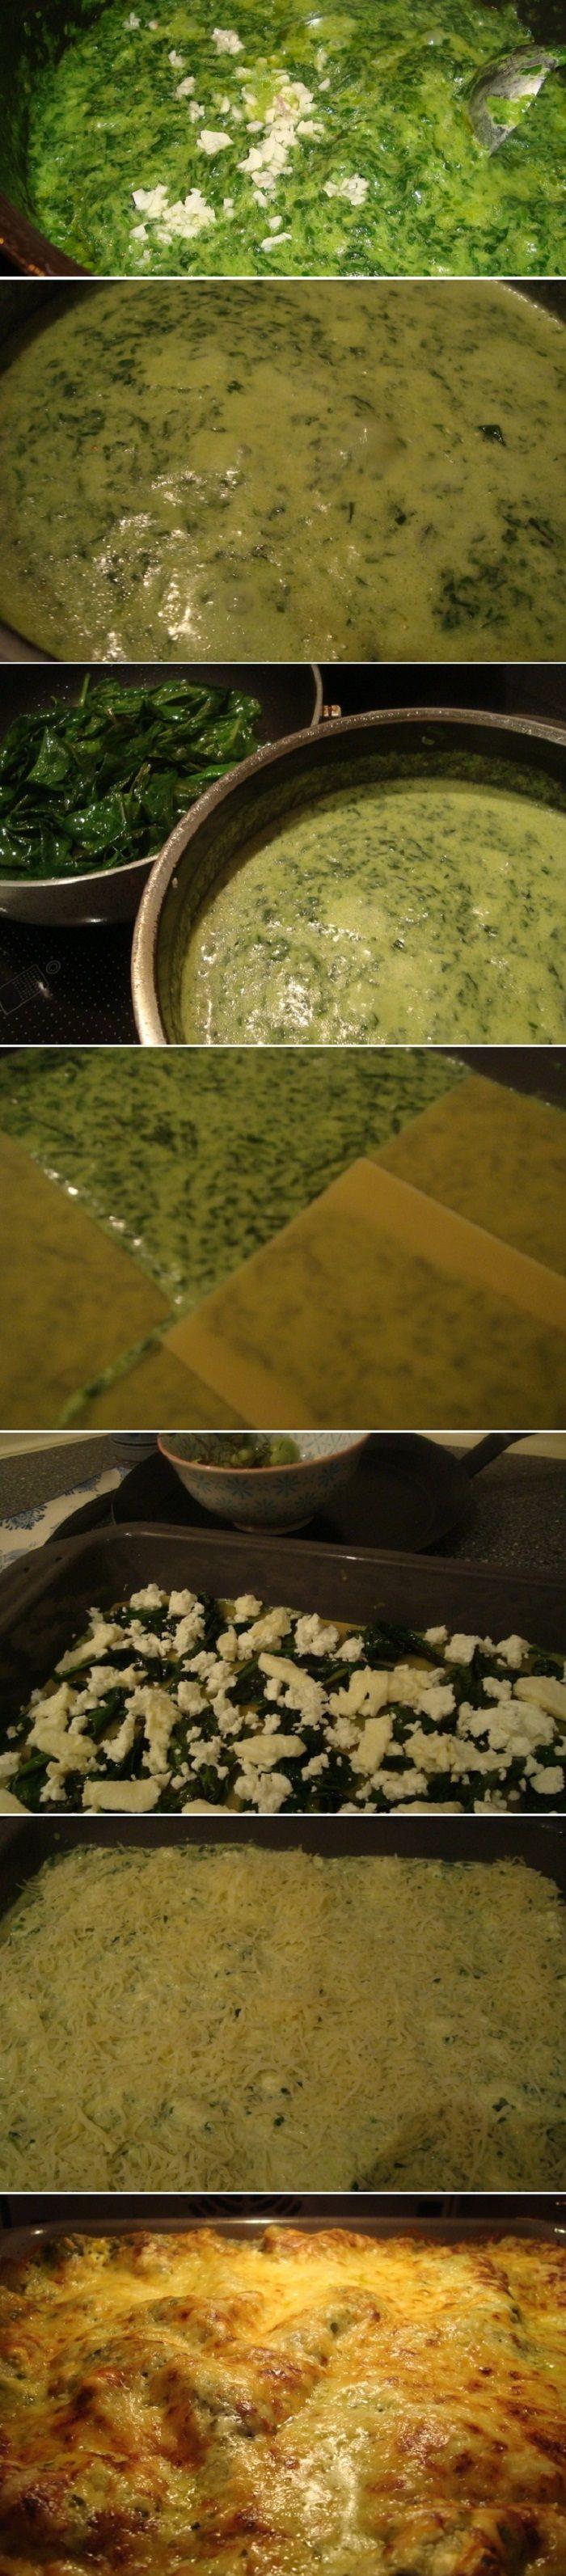 Spinach Feta Lasagna Recipe